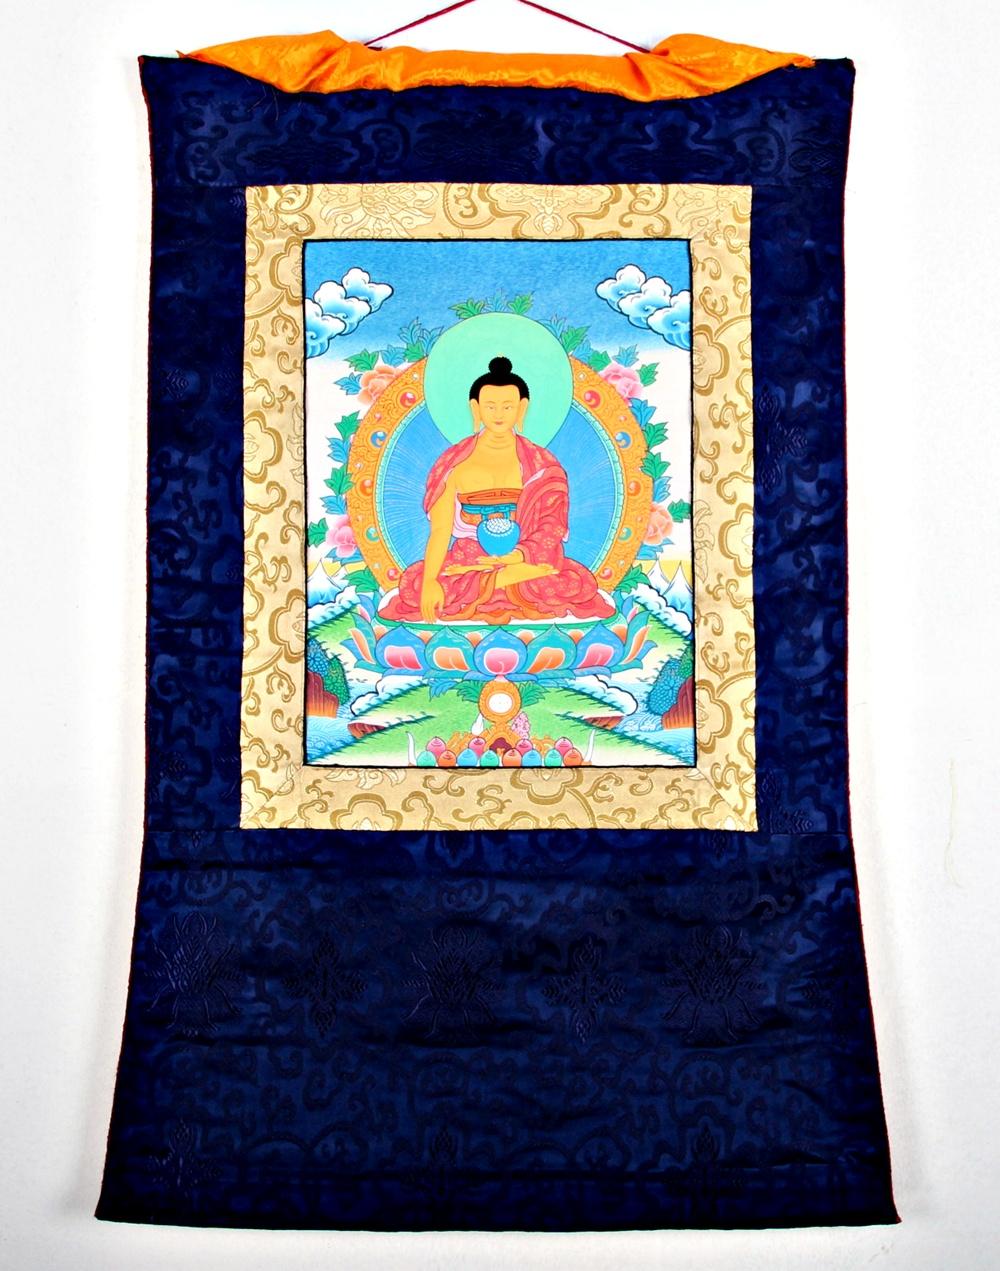 Buddha arts&more - THANGKA DES BUDDHA SHAKYAMUNI IM BLAUEN BROKATRAHMEN